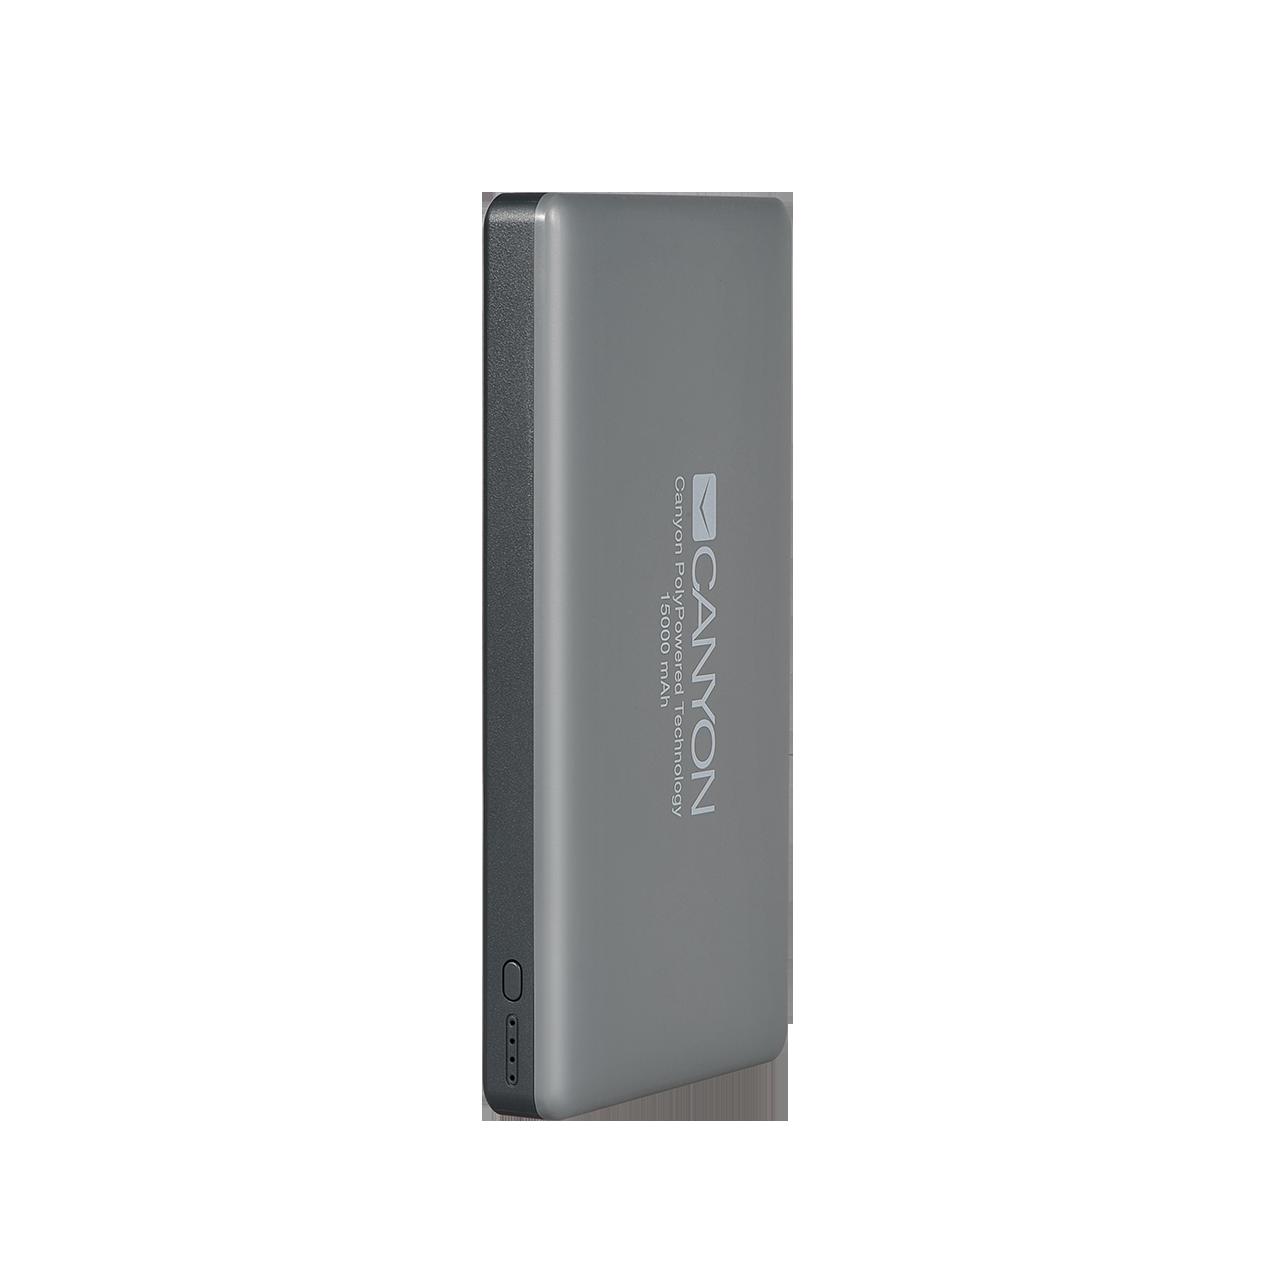 Baterie Externa Canyon CNS-TPBP15DG 15000mAh Gri